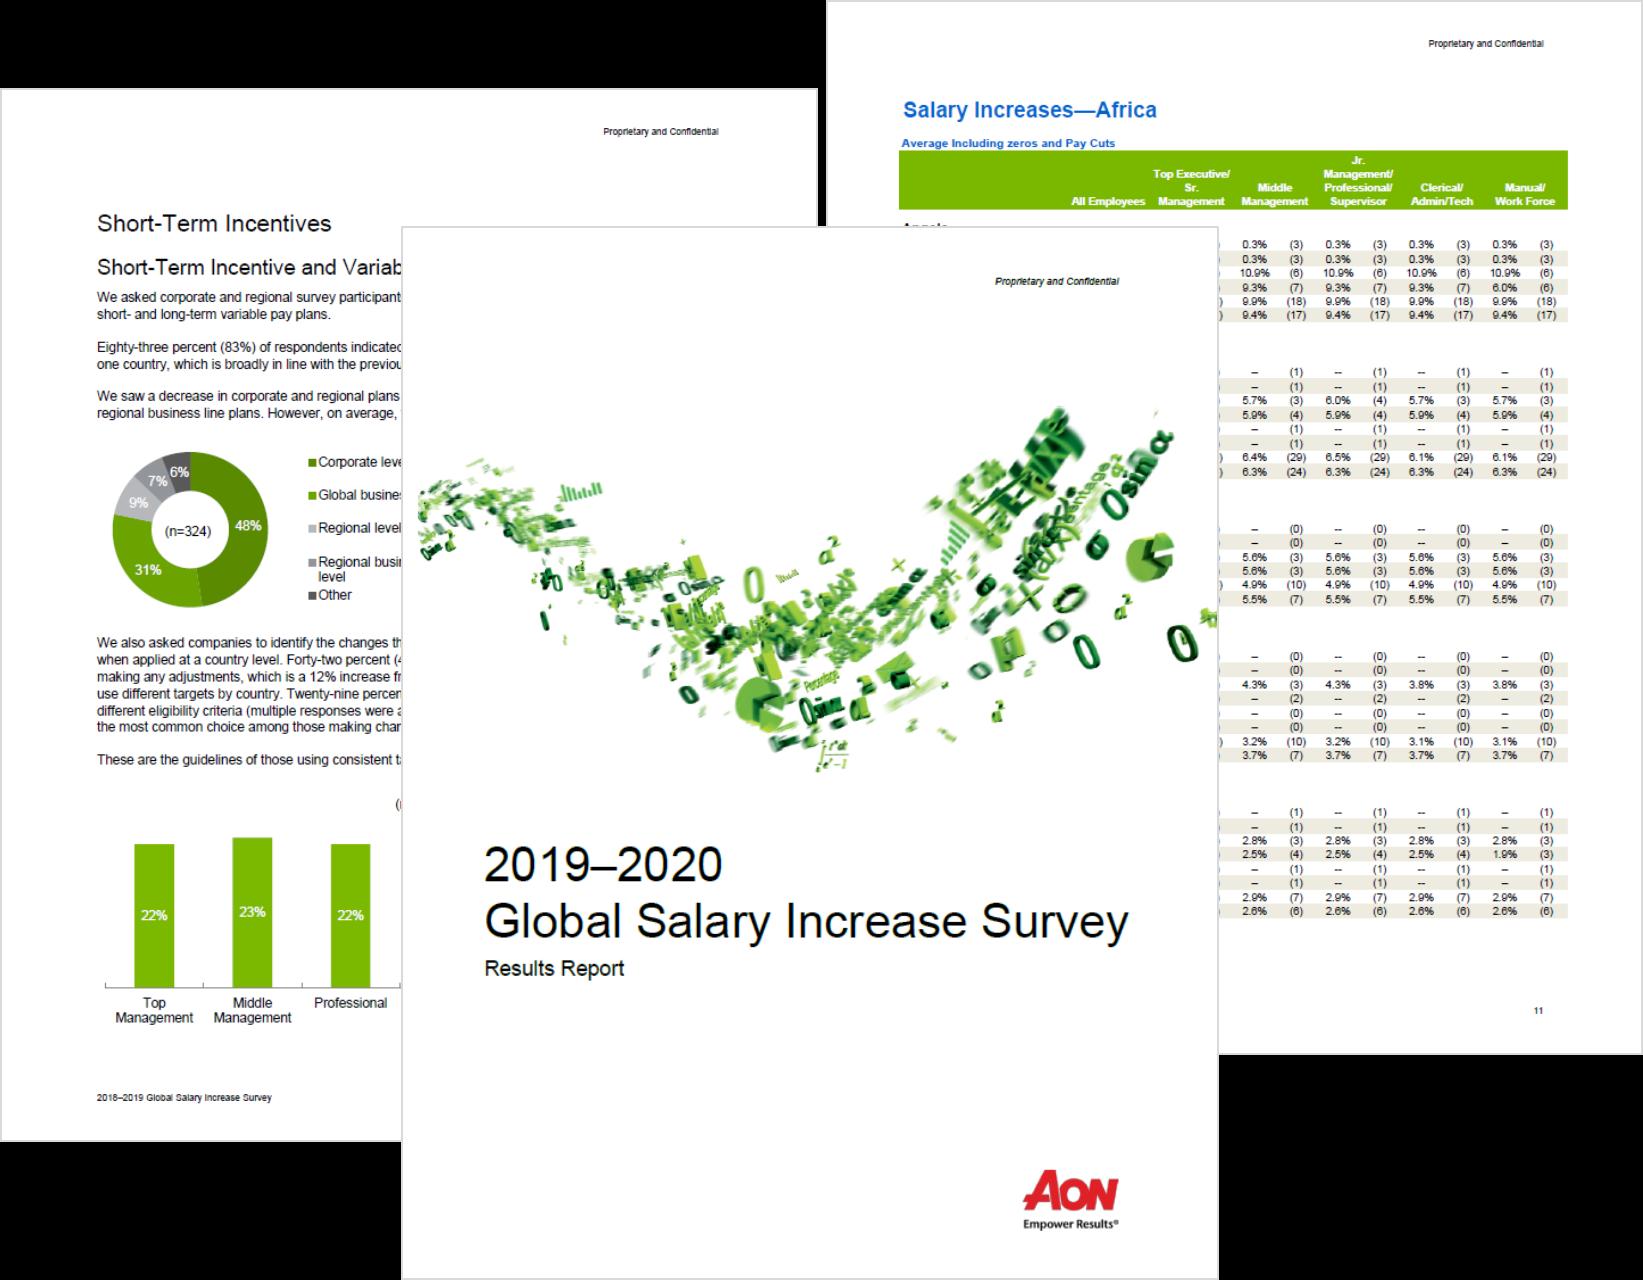 2019-2020 Global Salary Increase Survey